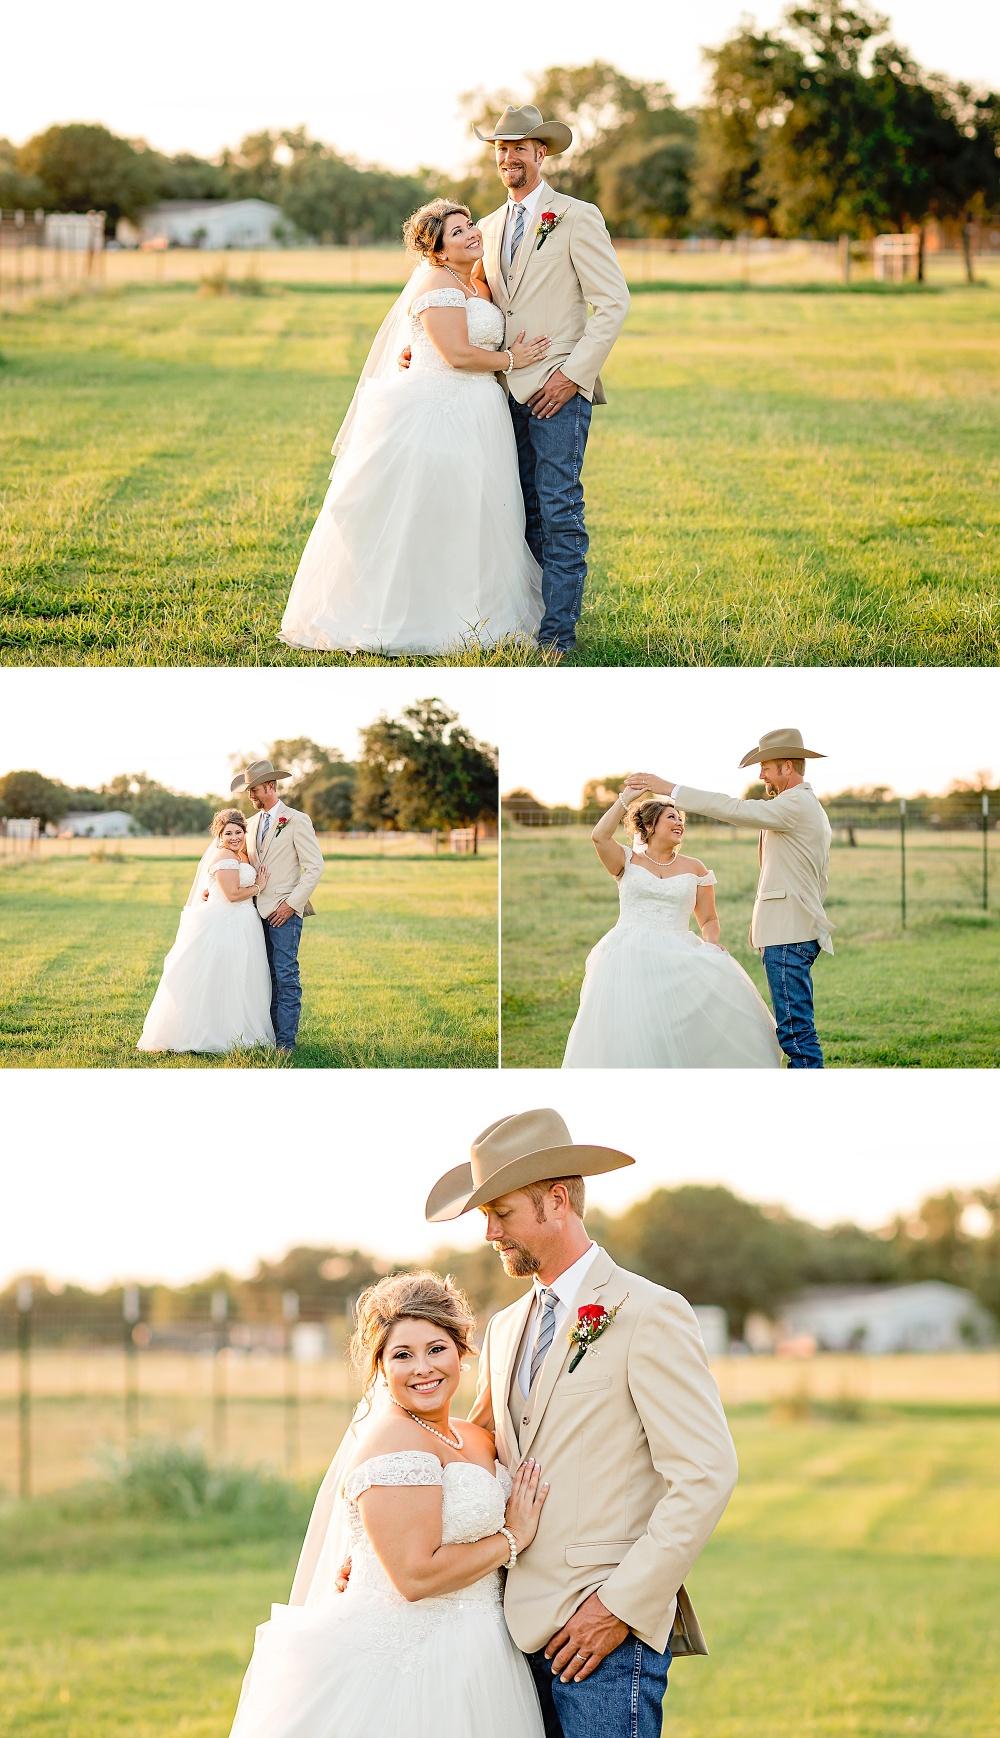 Wedding-Photographer-Rustic-Sunflower-theme-Texas-Carly-Barton-Photography_0118.jpg